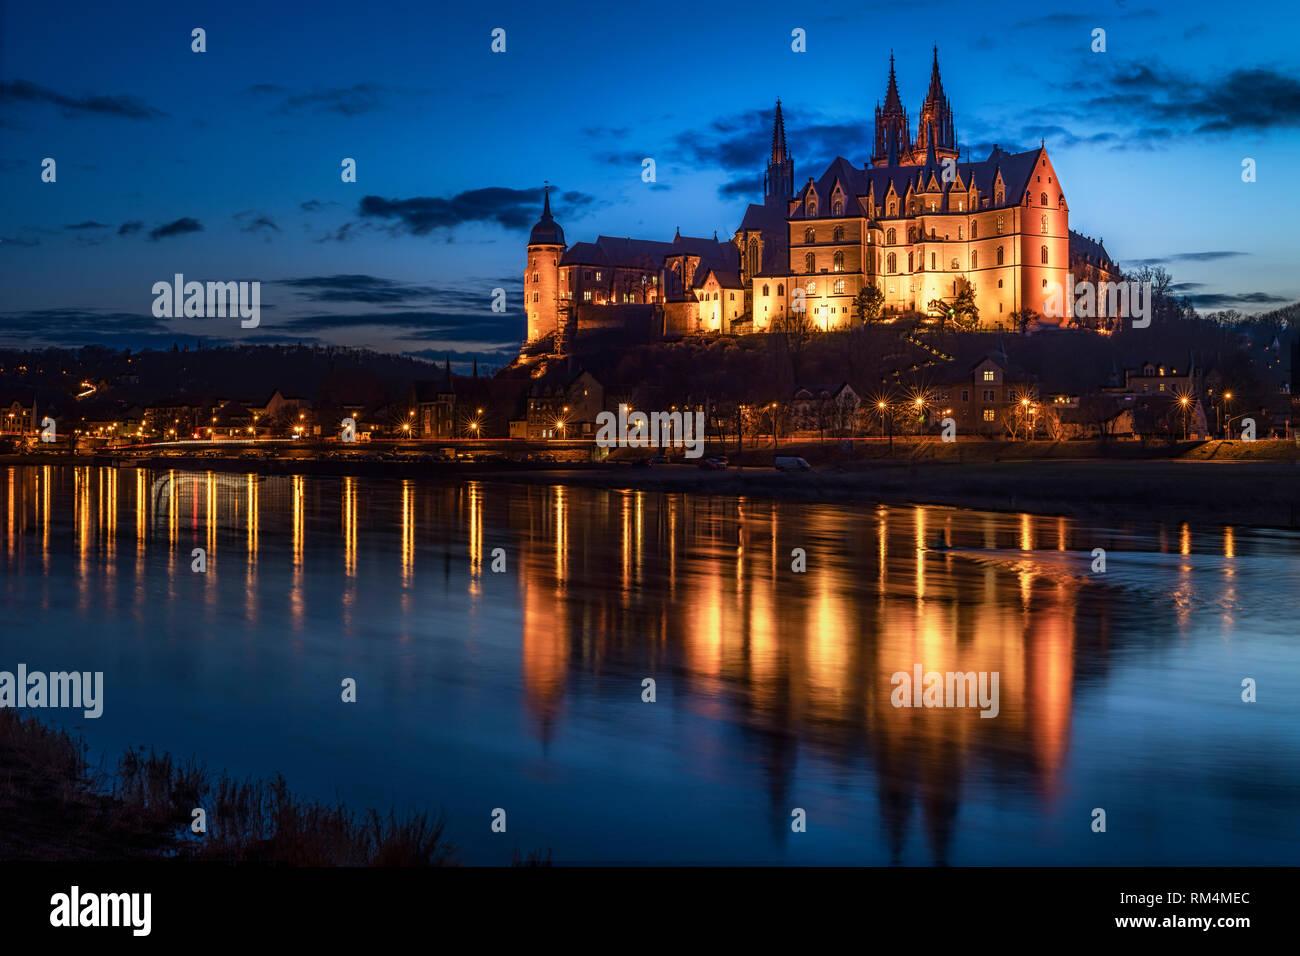 Schloss Albrechtsburg in Meißen am Abend - Stock Image